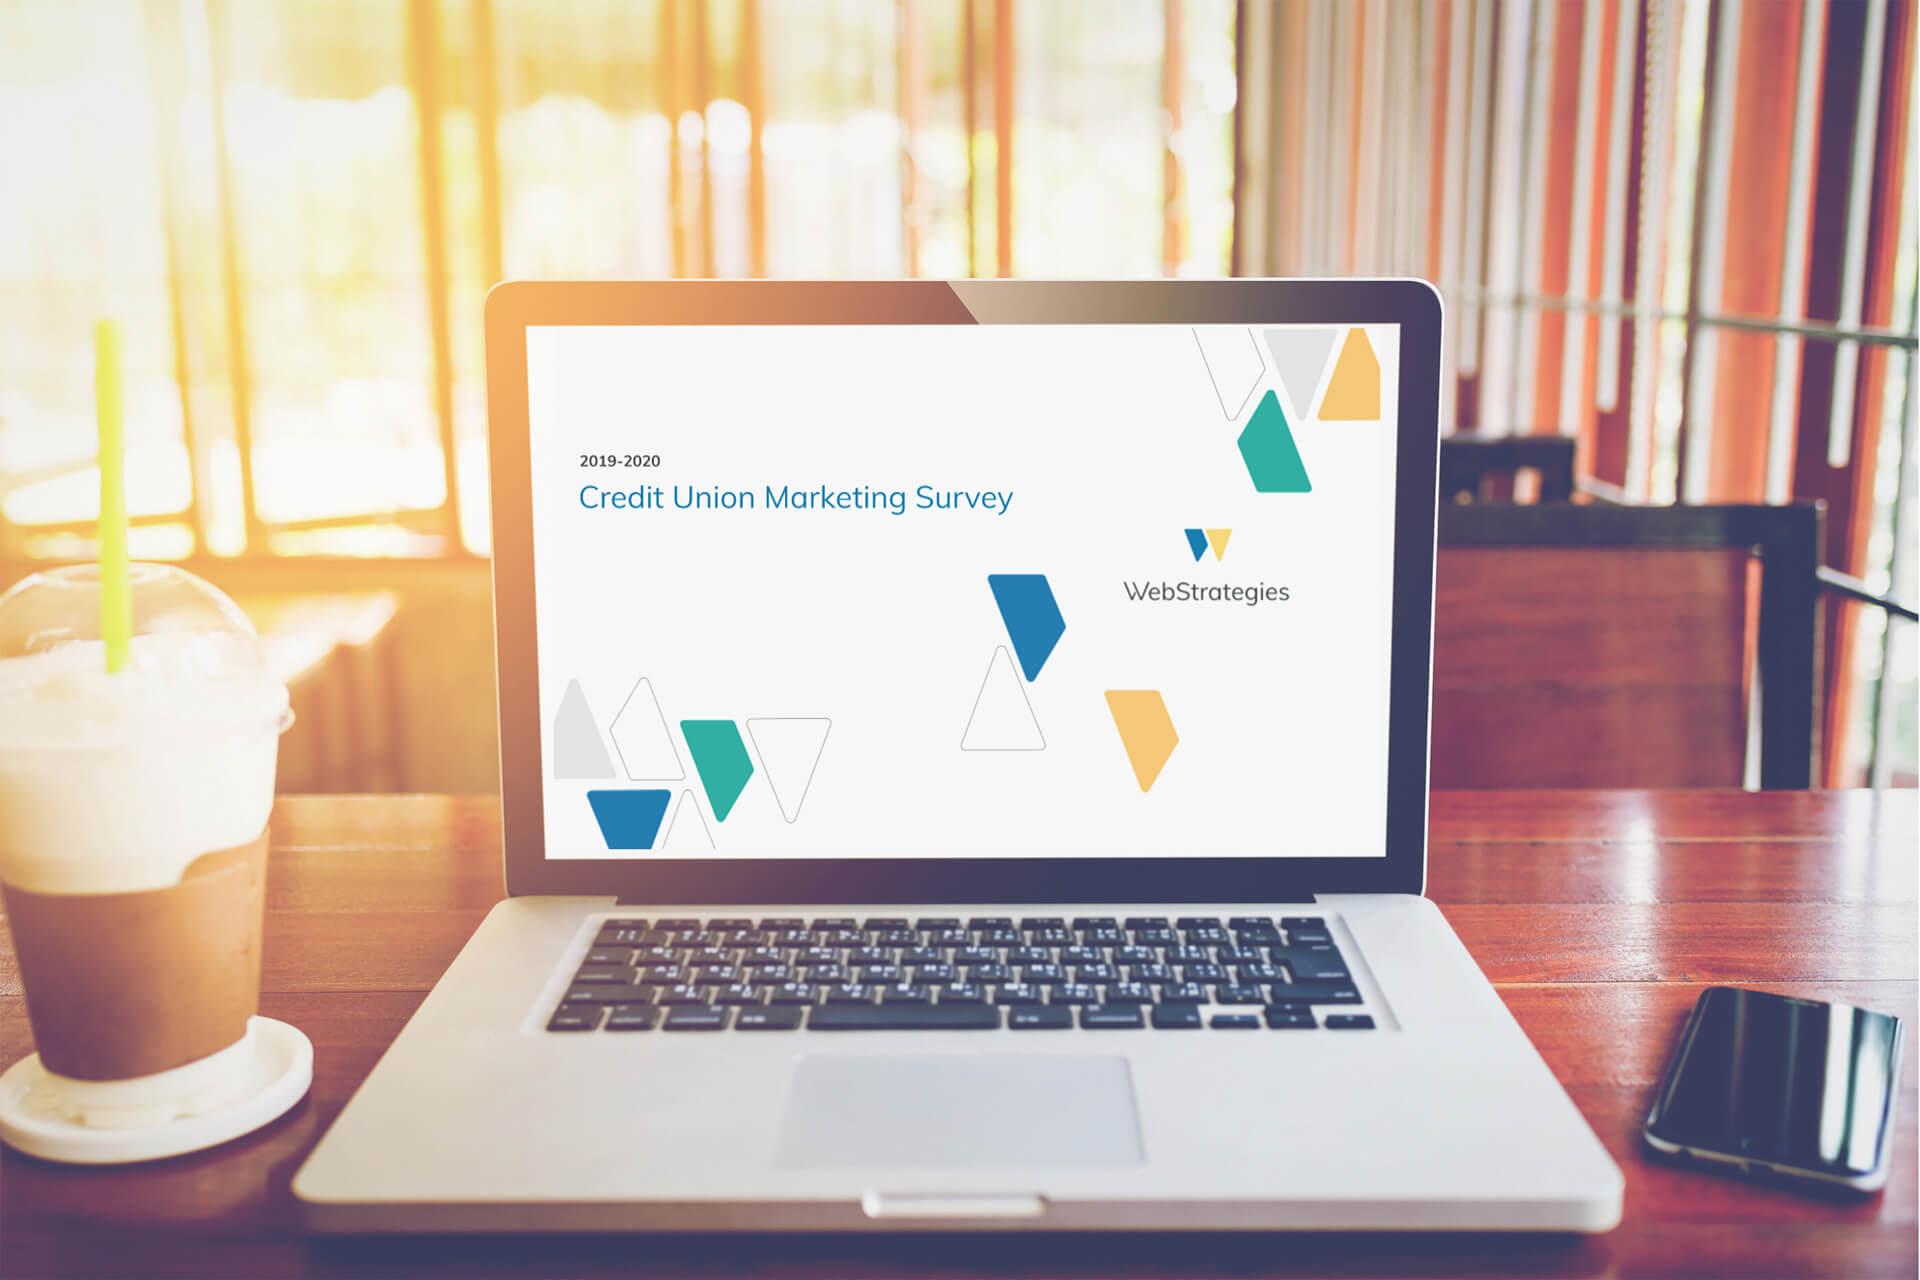 Credit Union Marketing Survey